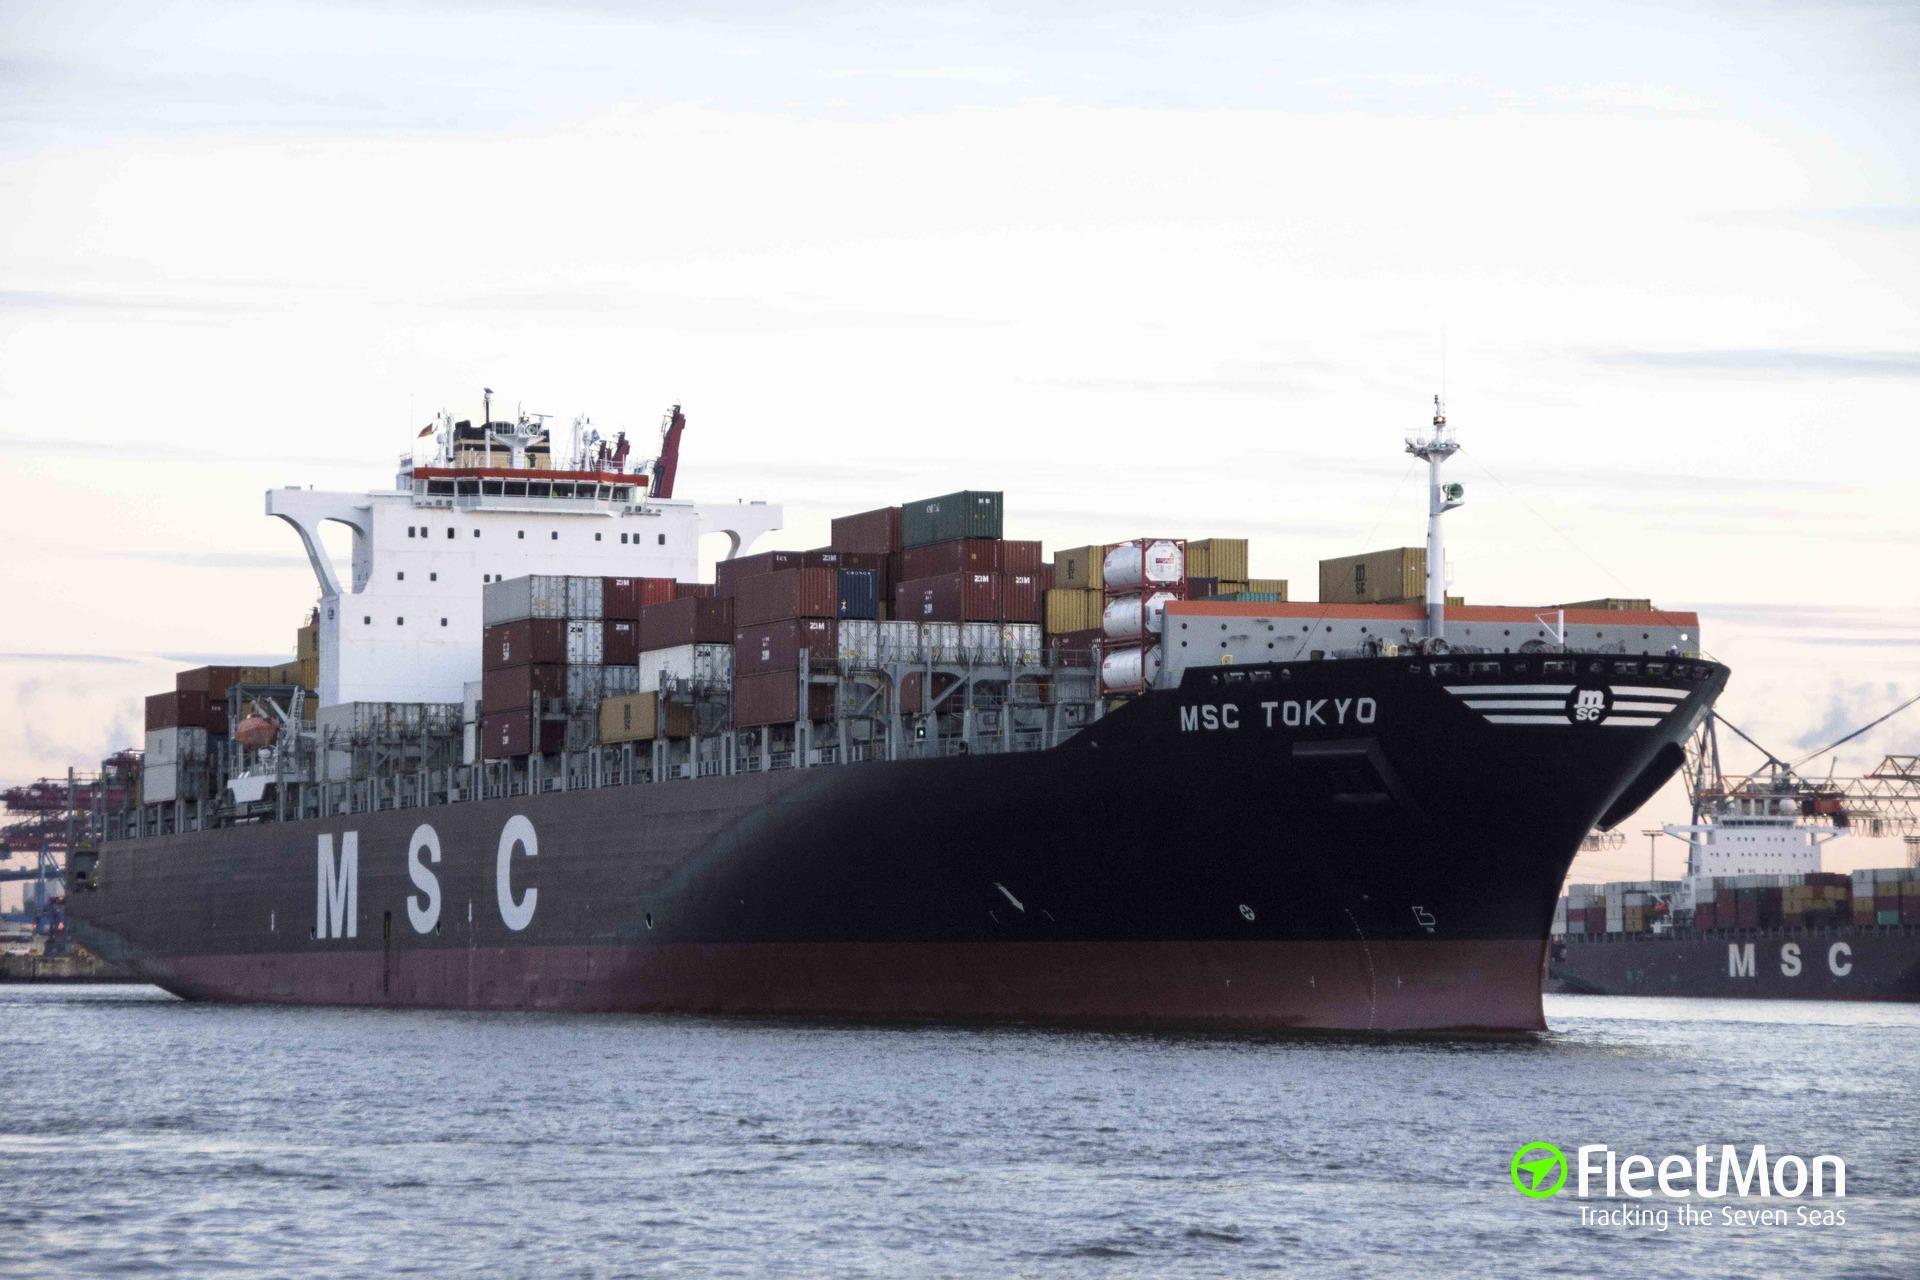 Boxship MSC Tokyo ran aground leaving Felixstowe, probably damaged